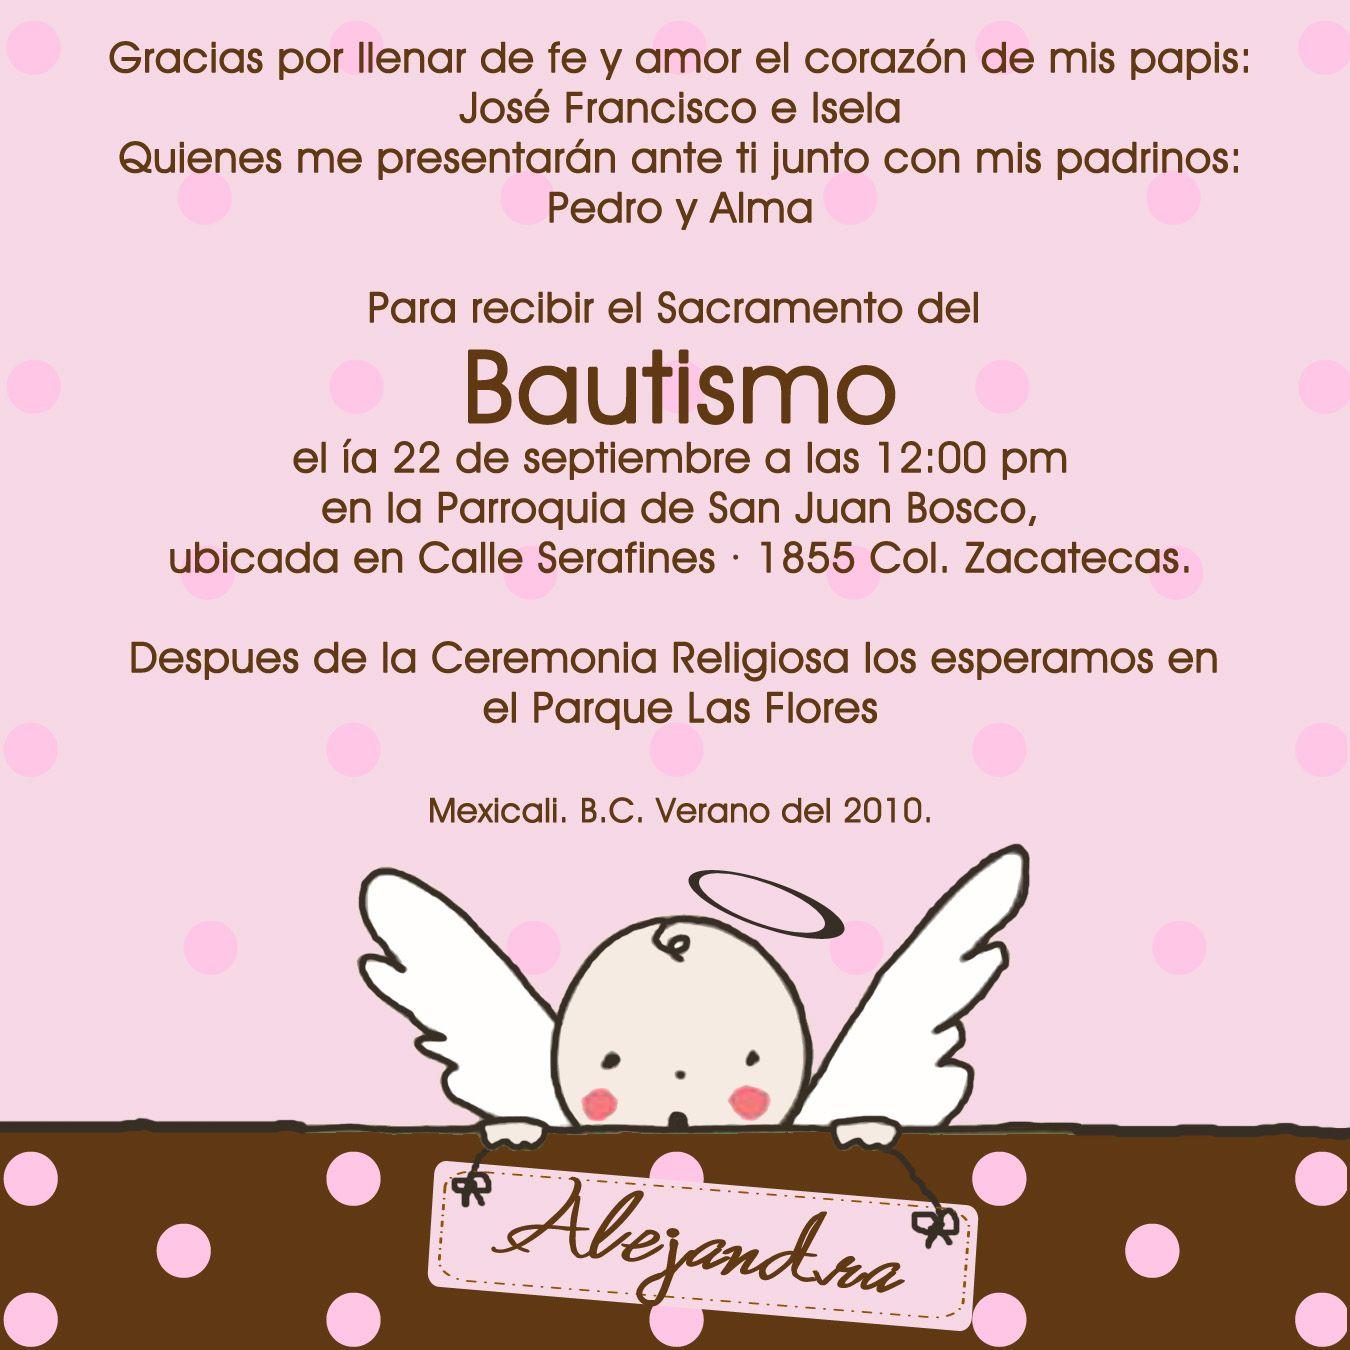 40 Awesome Invitaciones Angelitos Para Bautizo Gratis Images